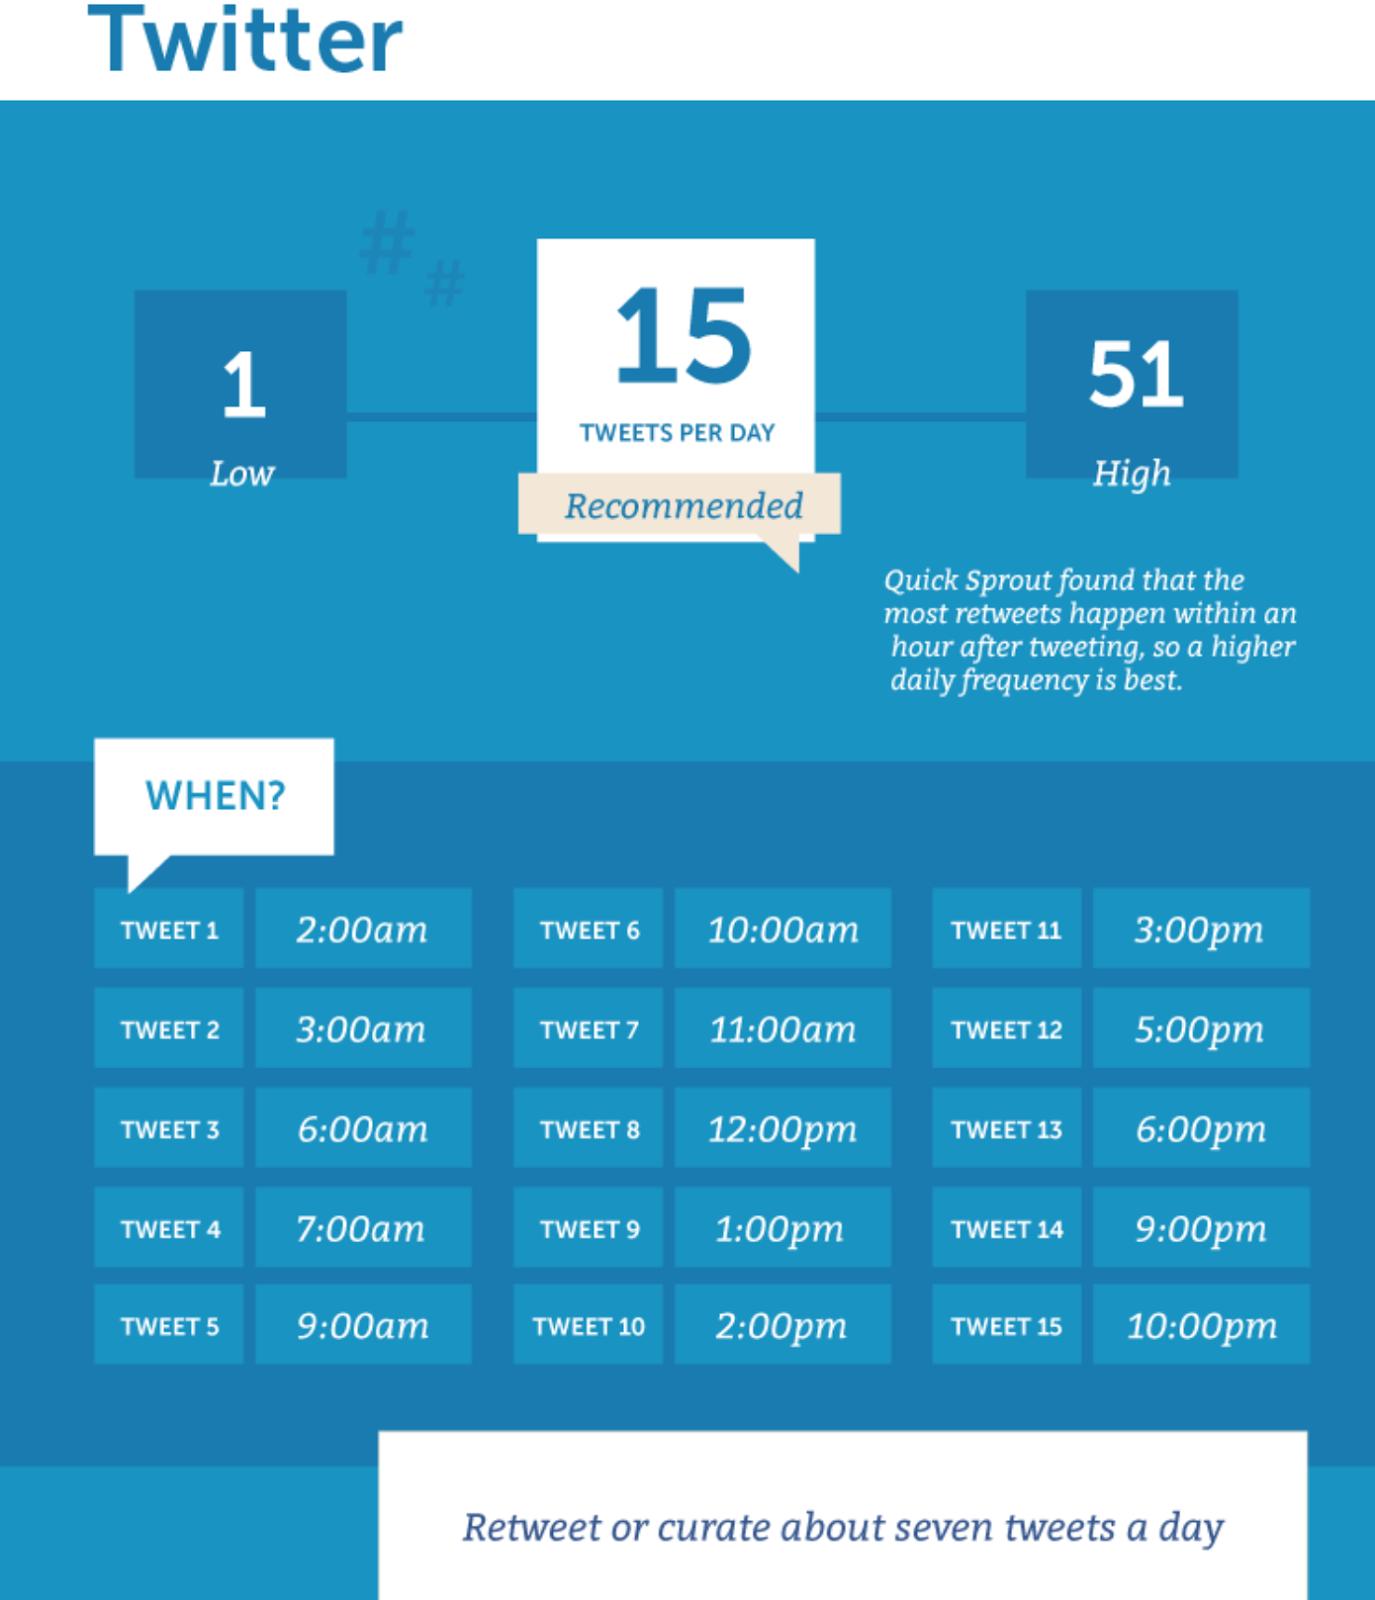 average Tweets per day